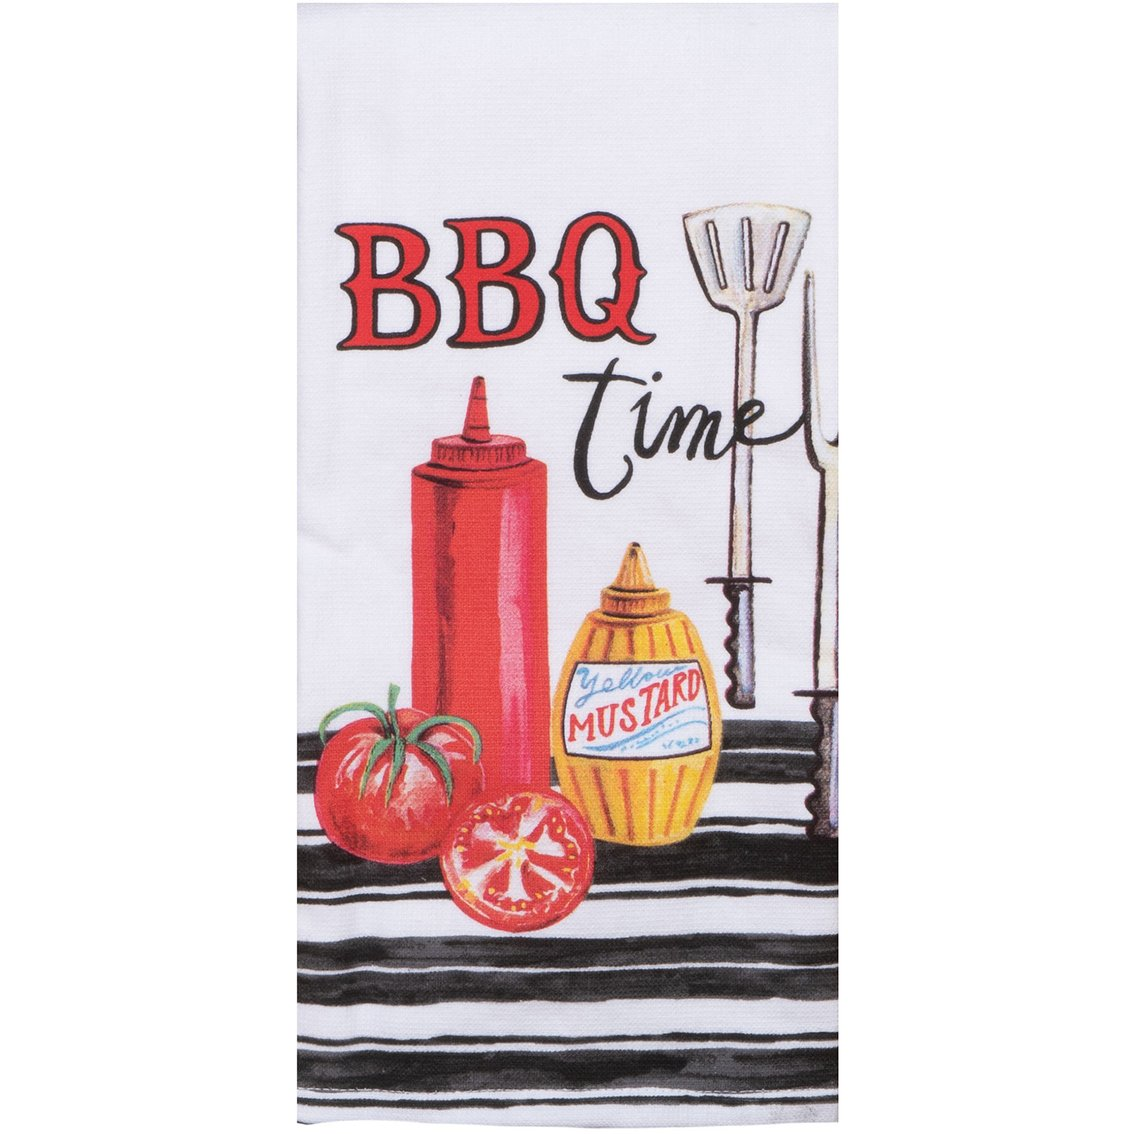 BBQ Time DP Terry